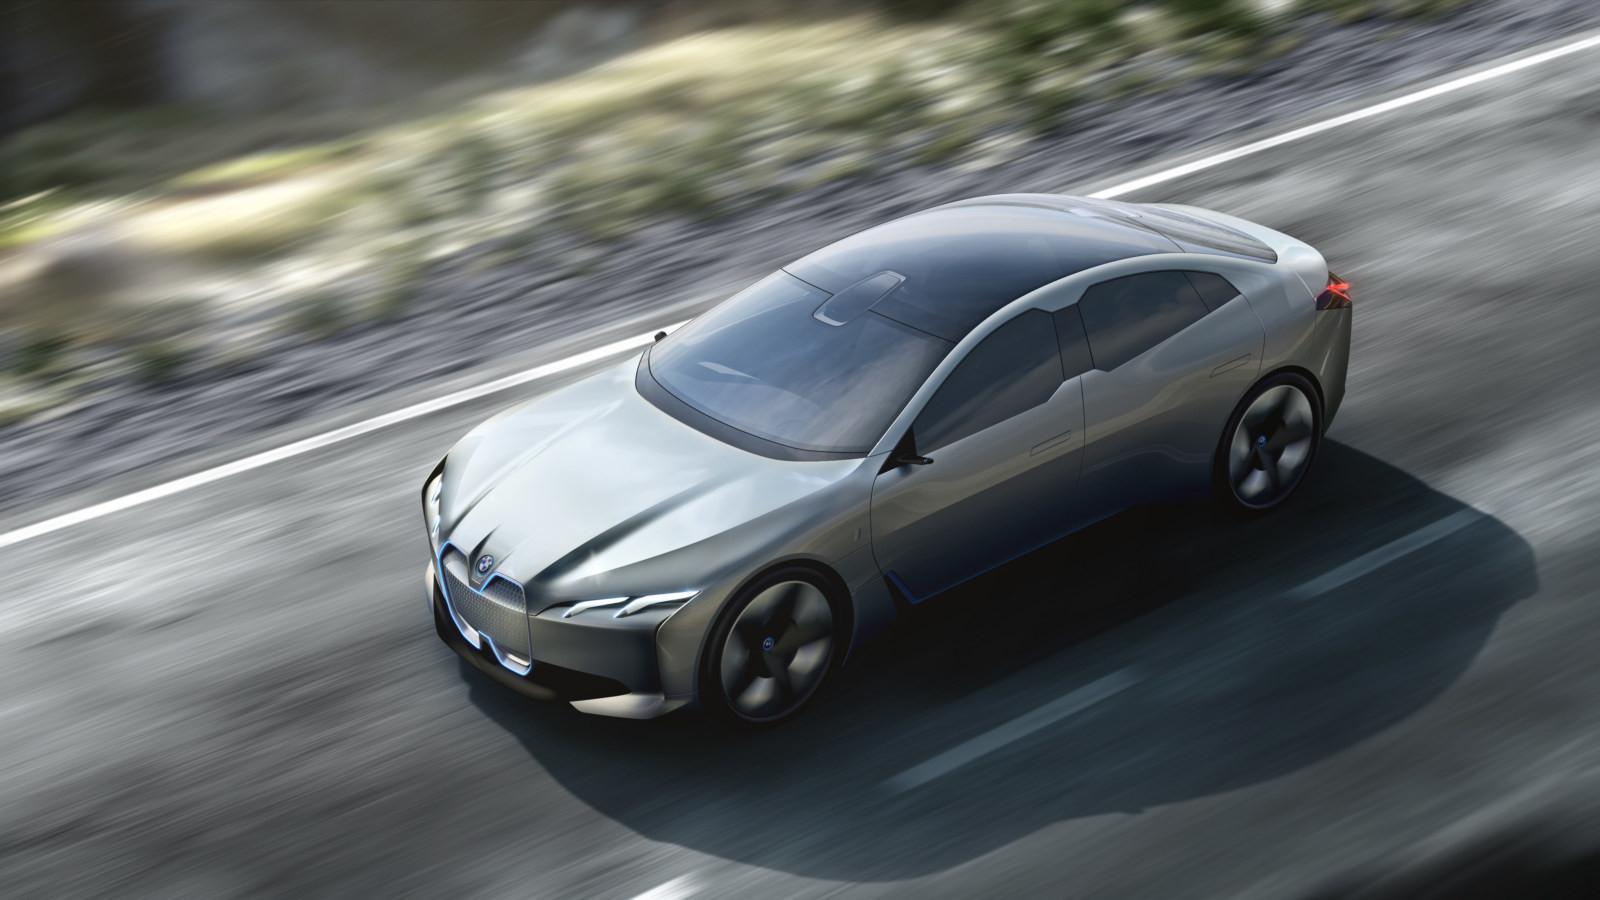 БМВ готовит конкурента Model 3 отTesla